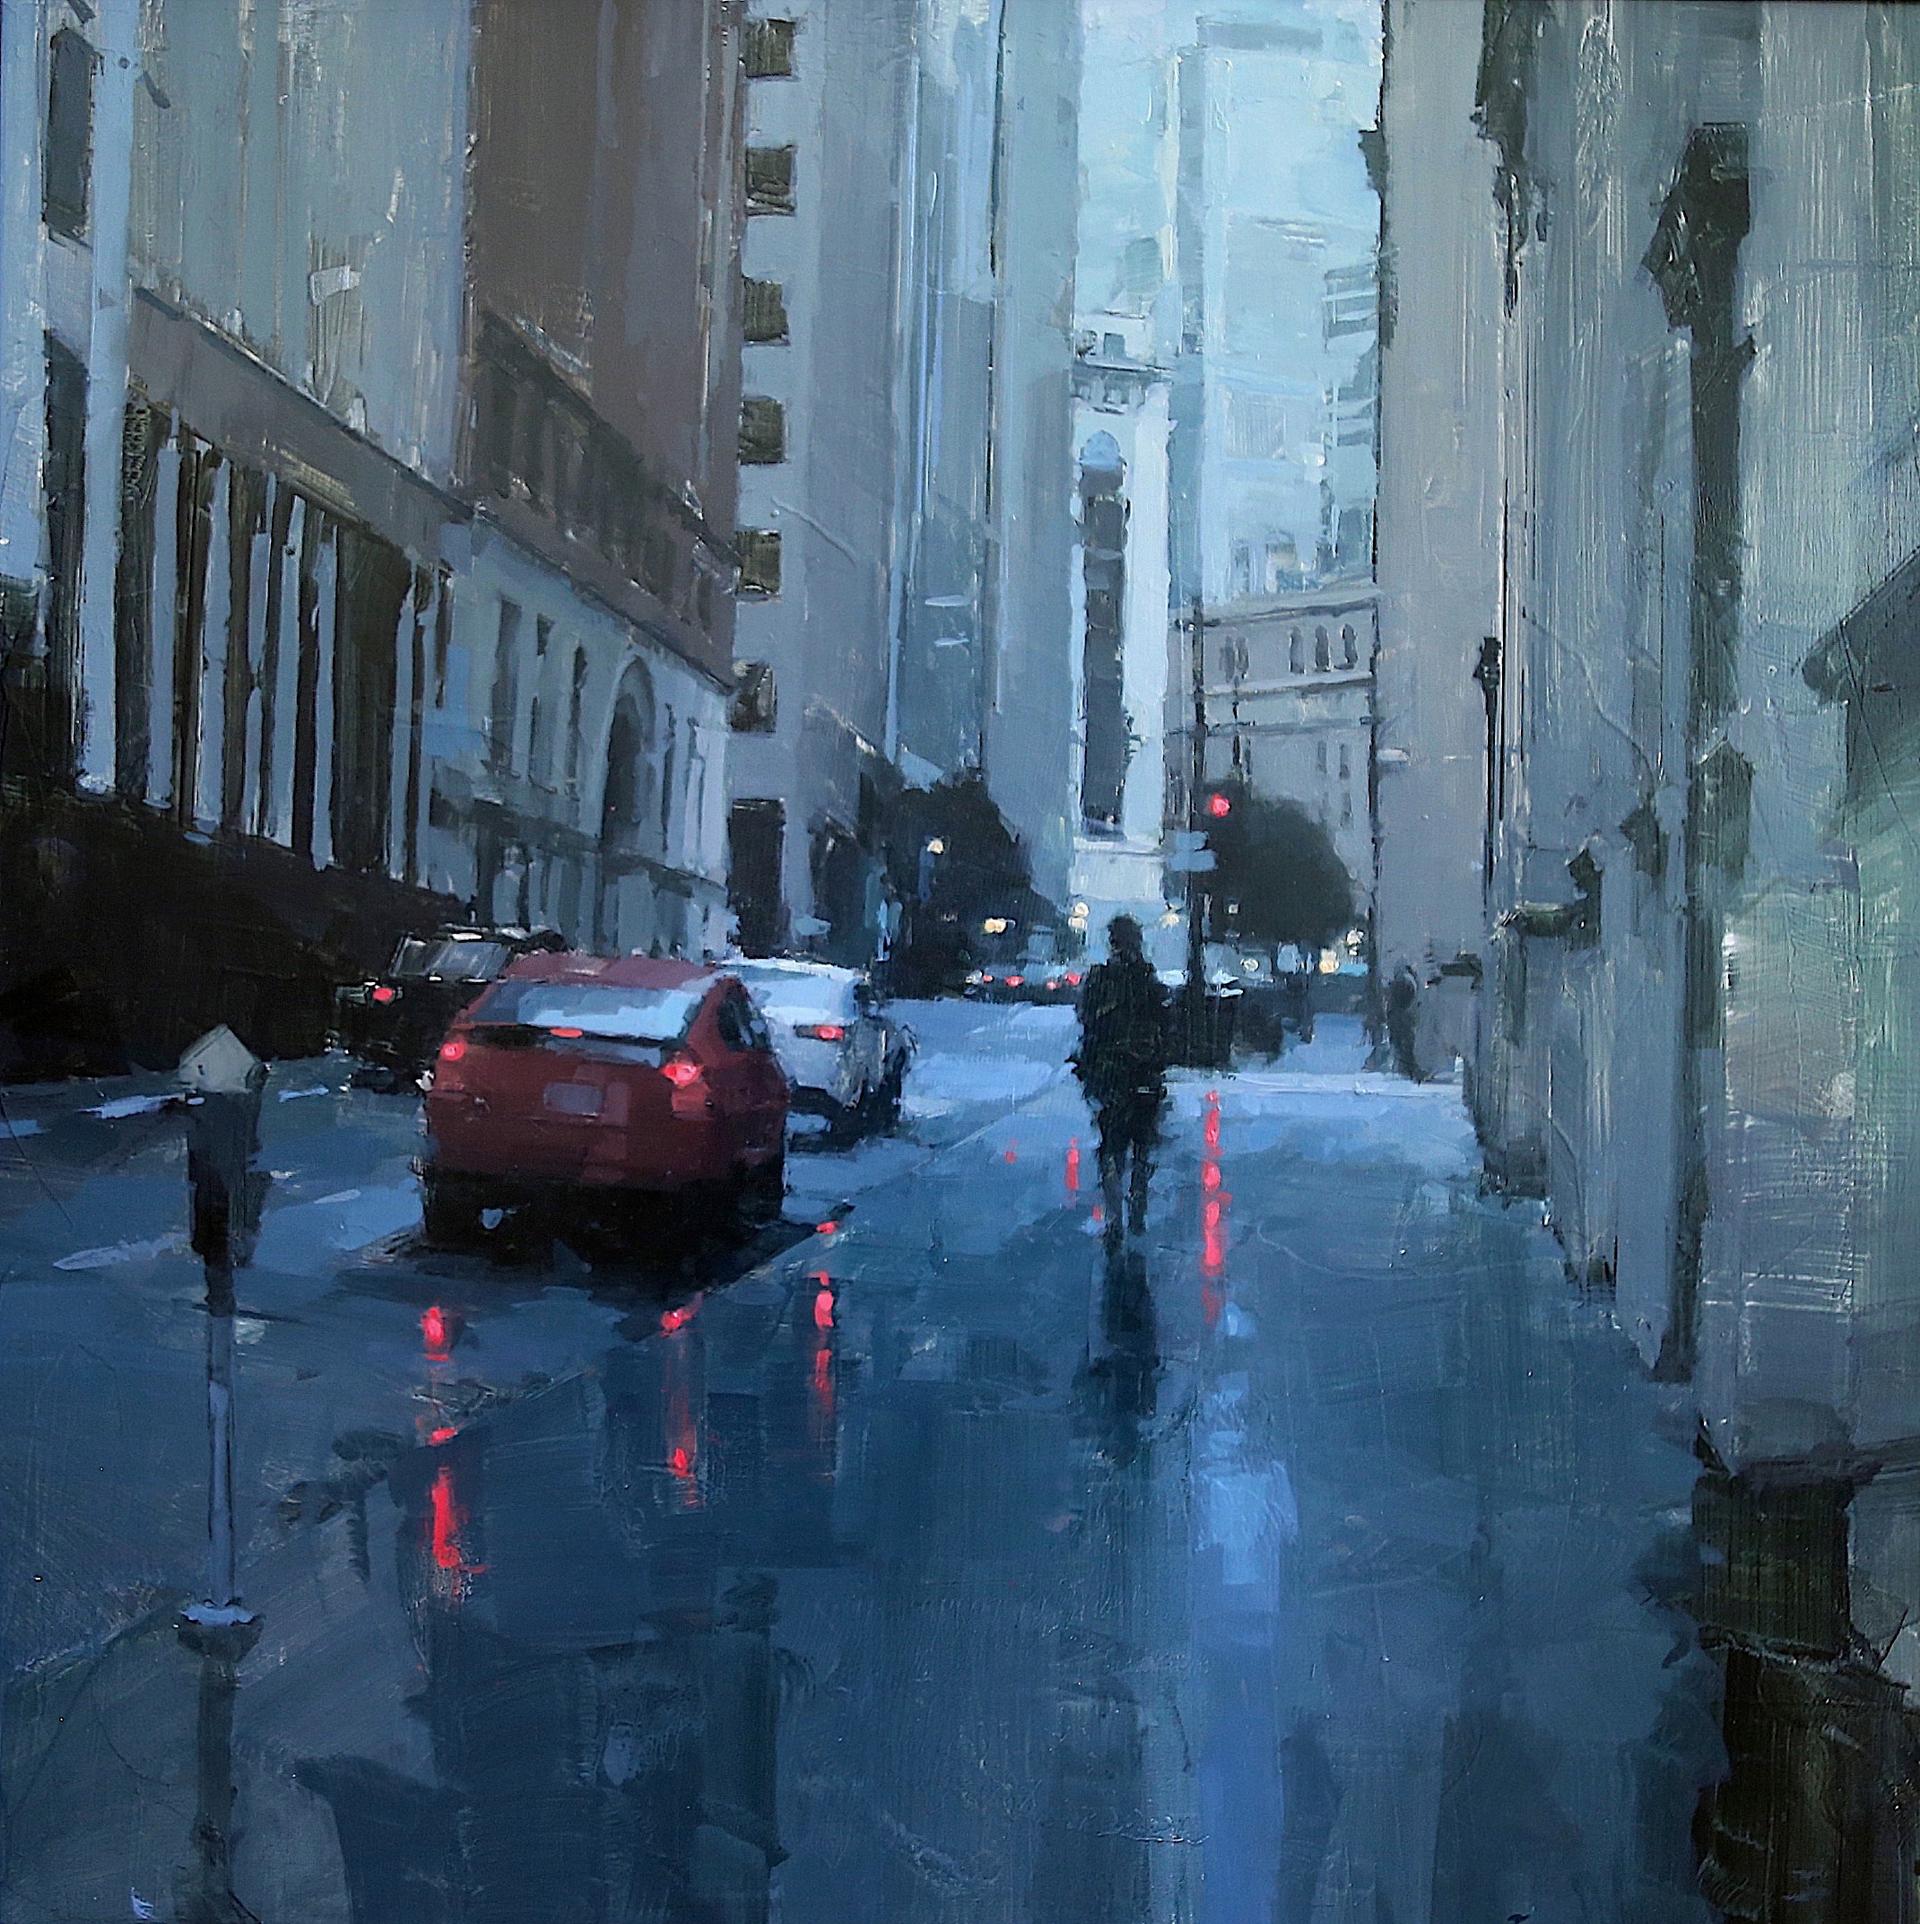 Rainscape by James Kroner